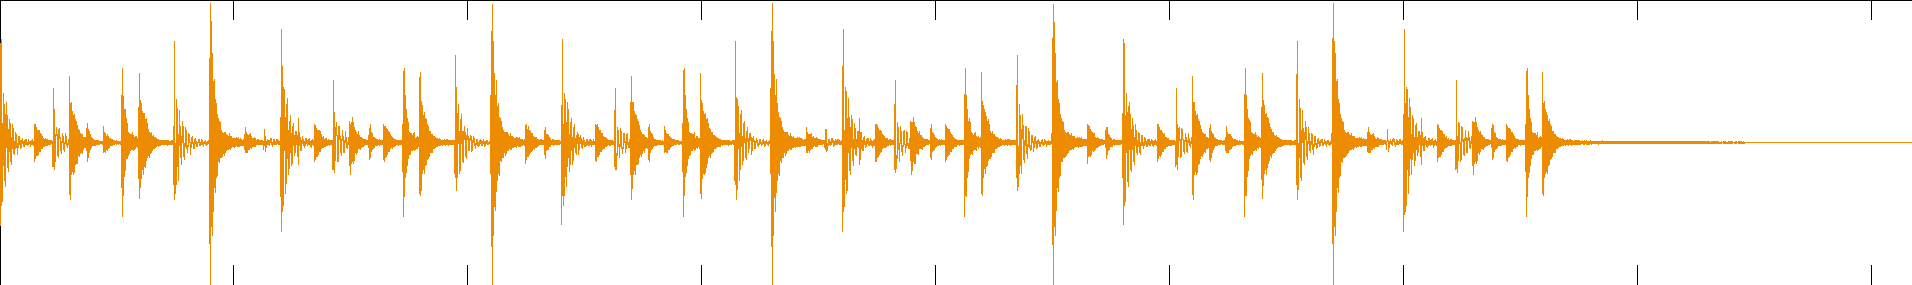 WaveDrum02_23_MIX